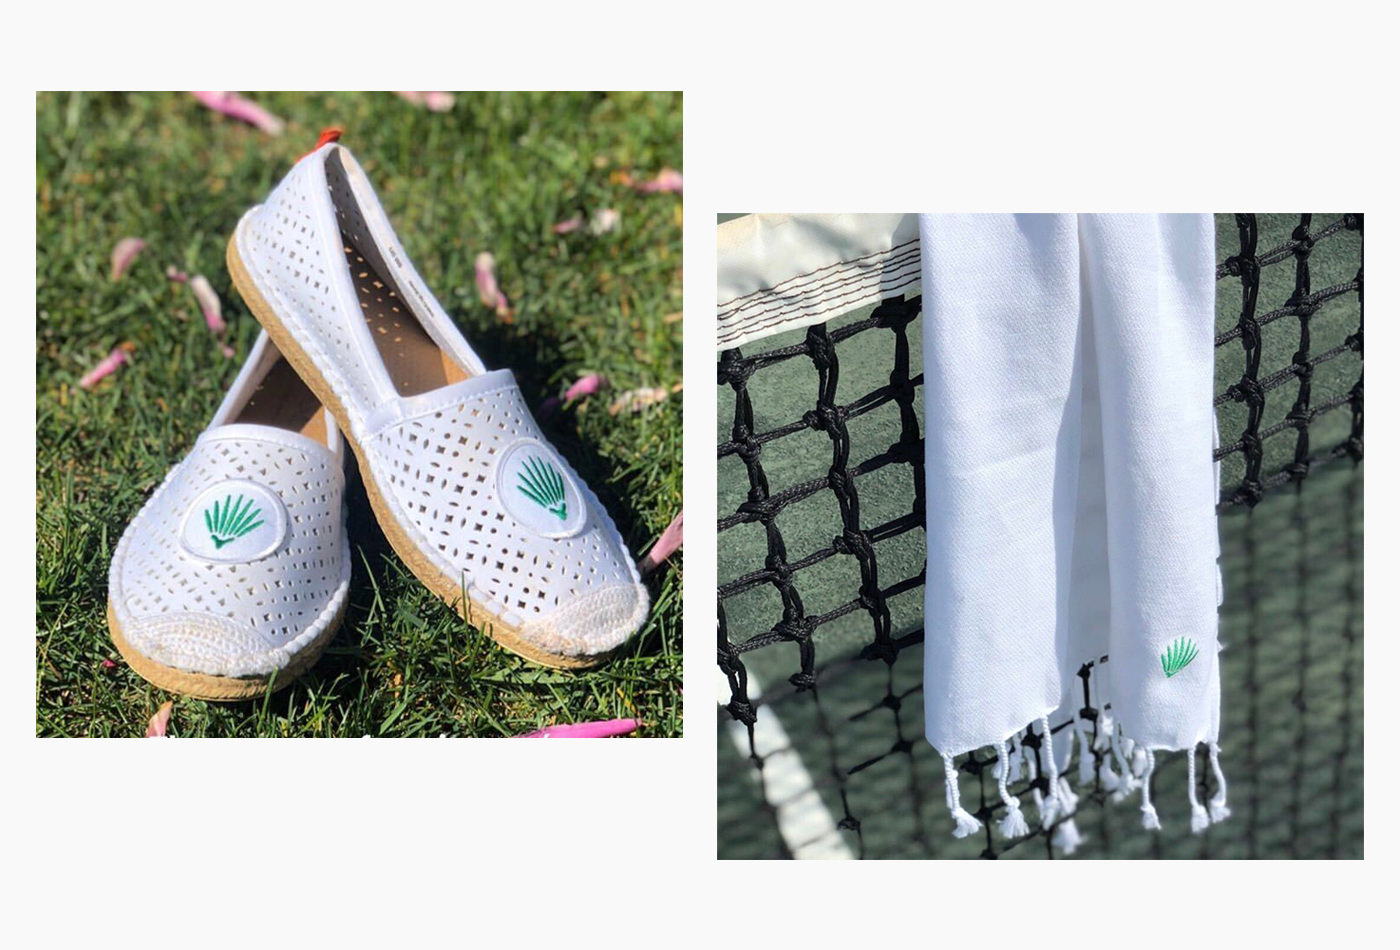 hedge-dress-polo-vacaliebres-hedgehog-logo-hat-cap-smarthers-branson-espedrillas-slippers